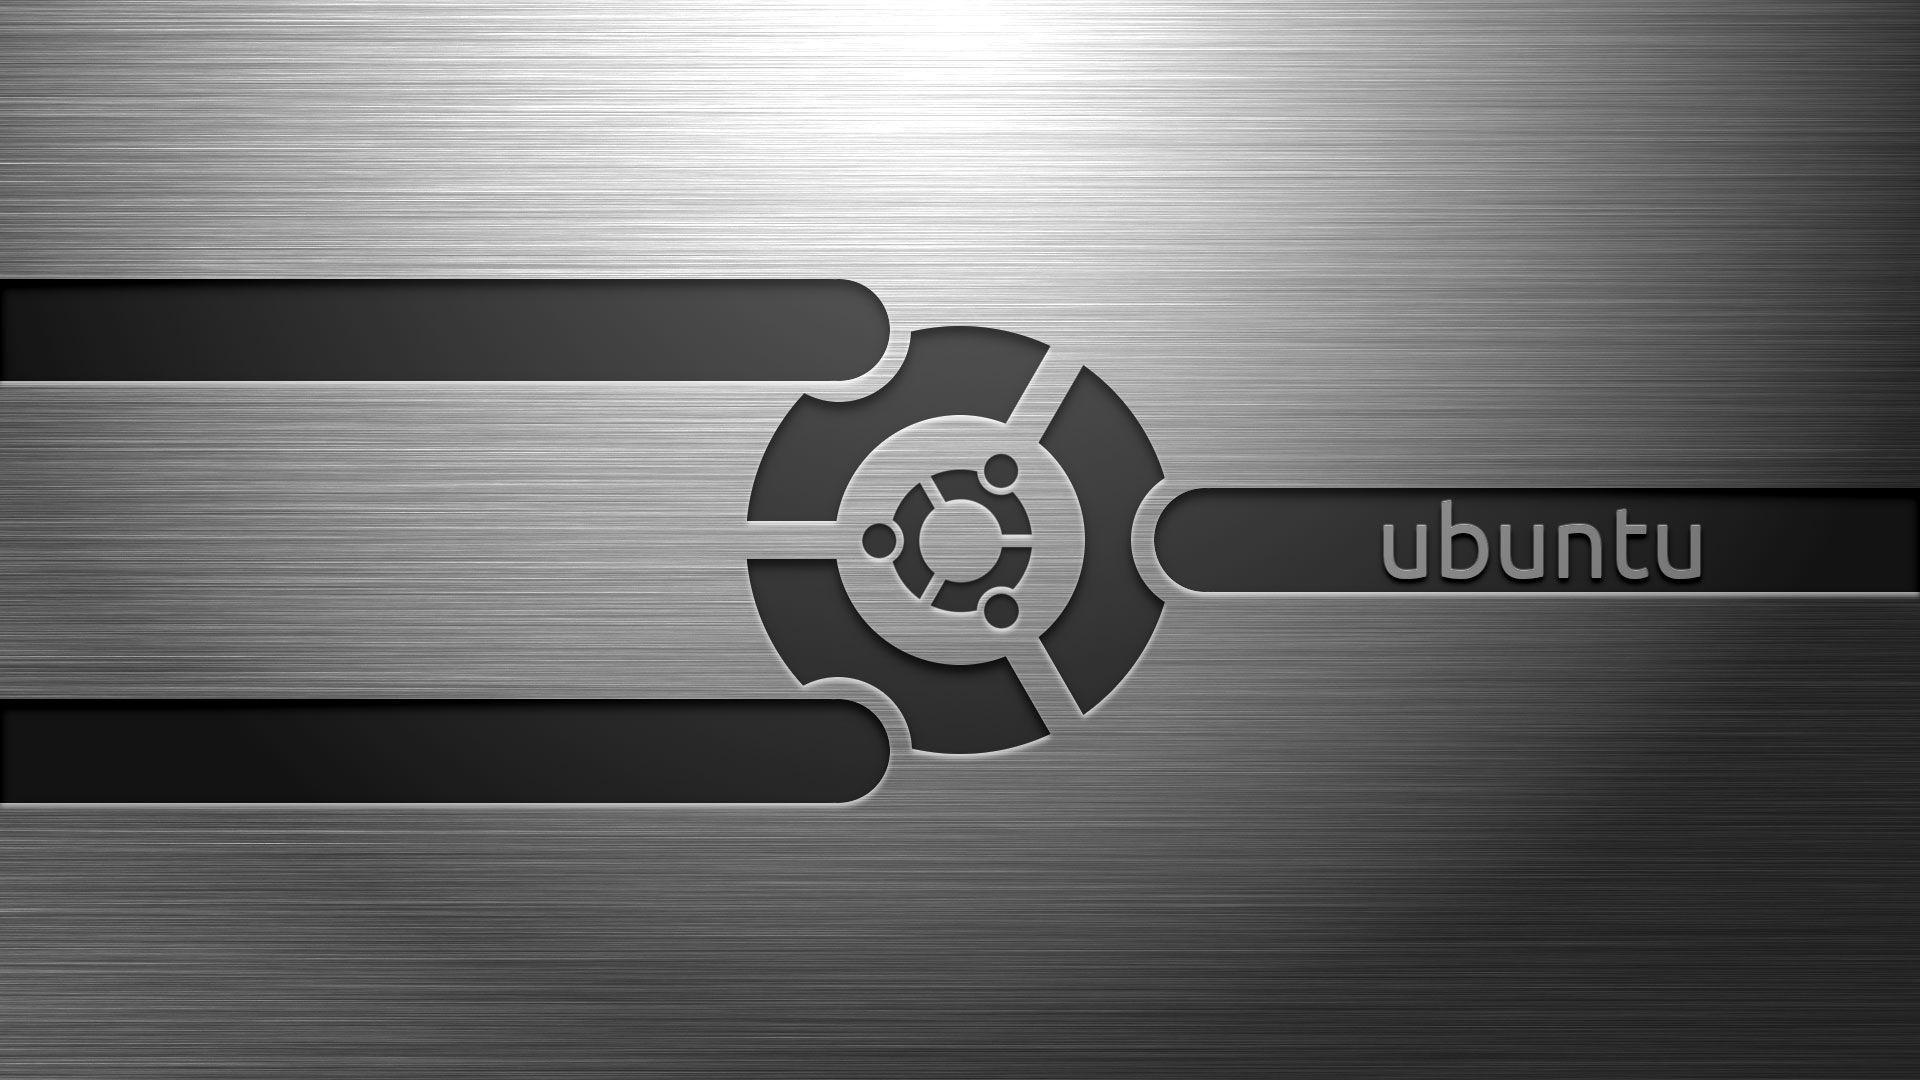 FEDORA VS Ubuntu